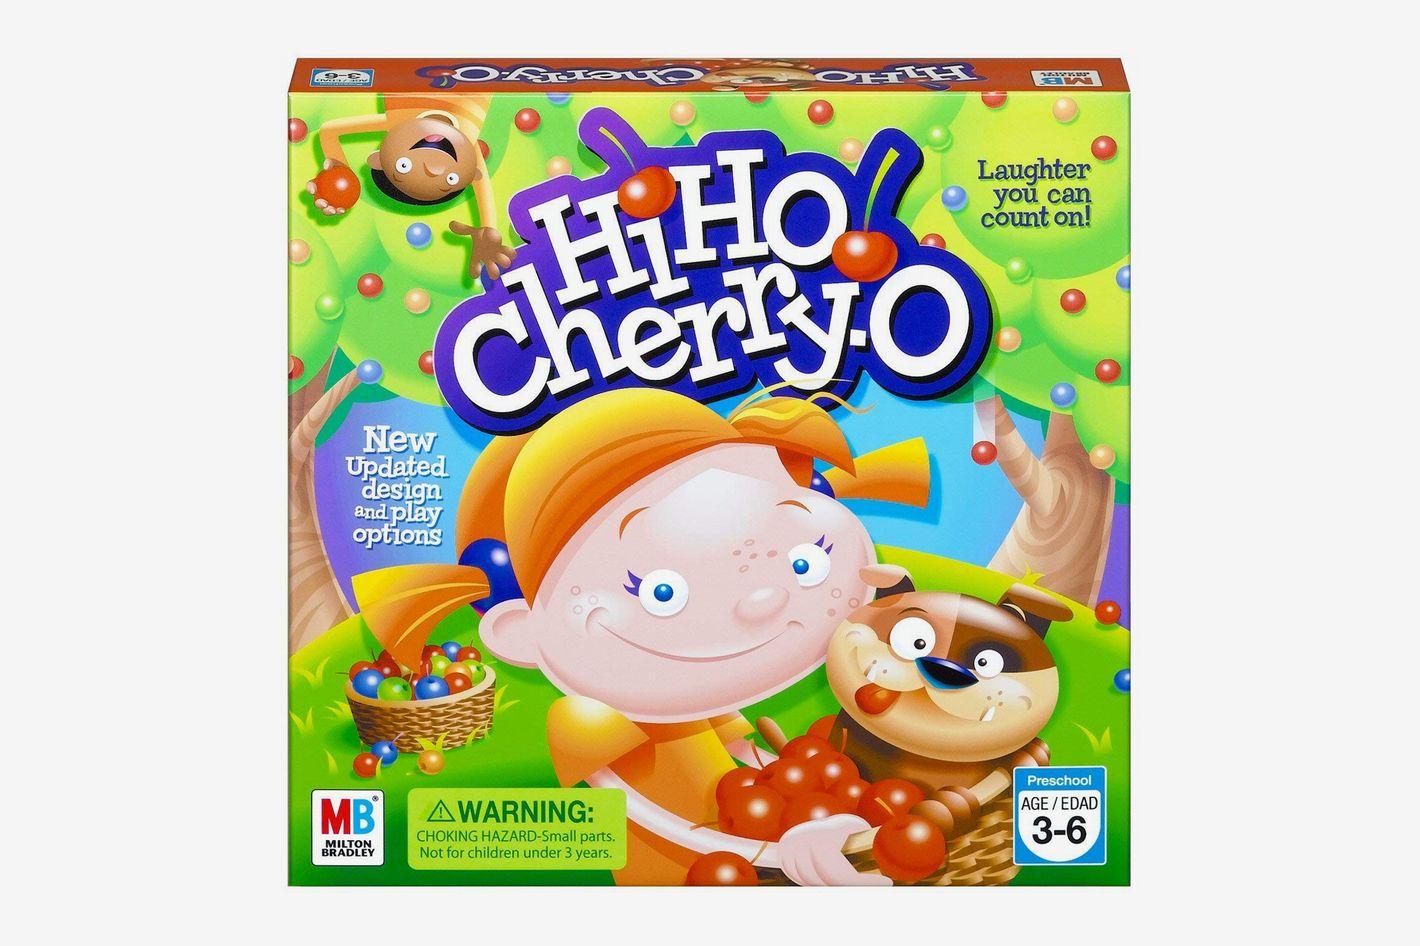 Hi Ho! Cherry-O